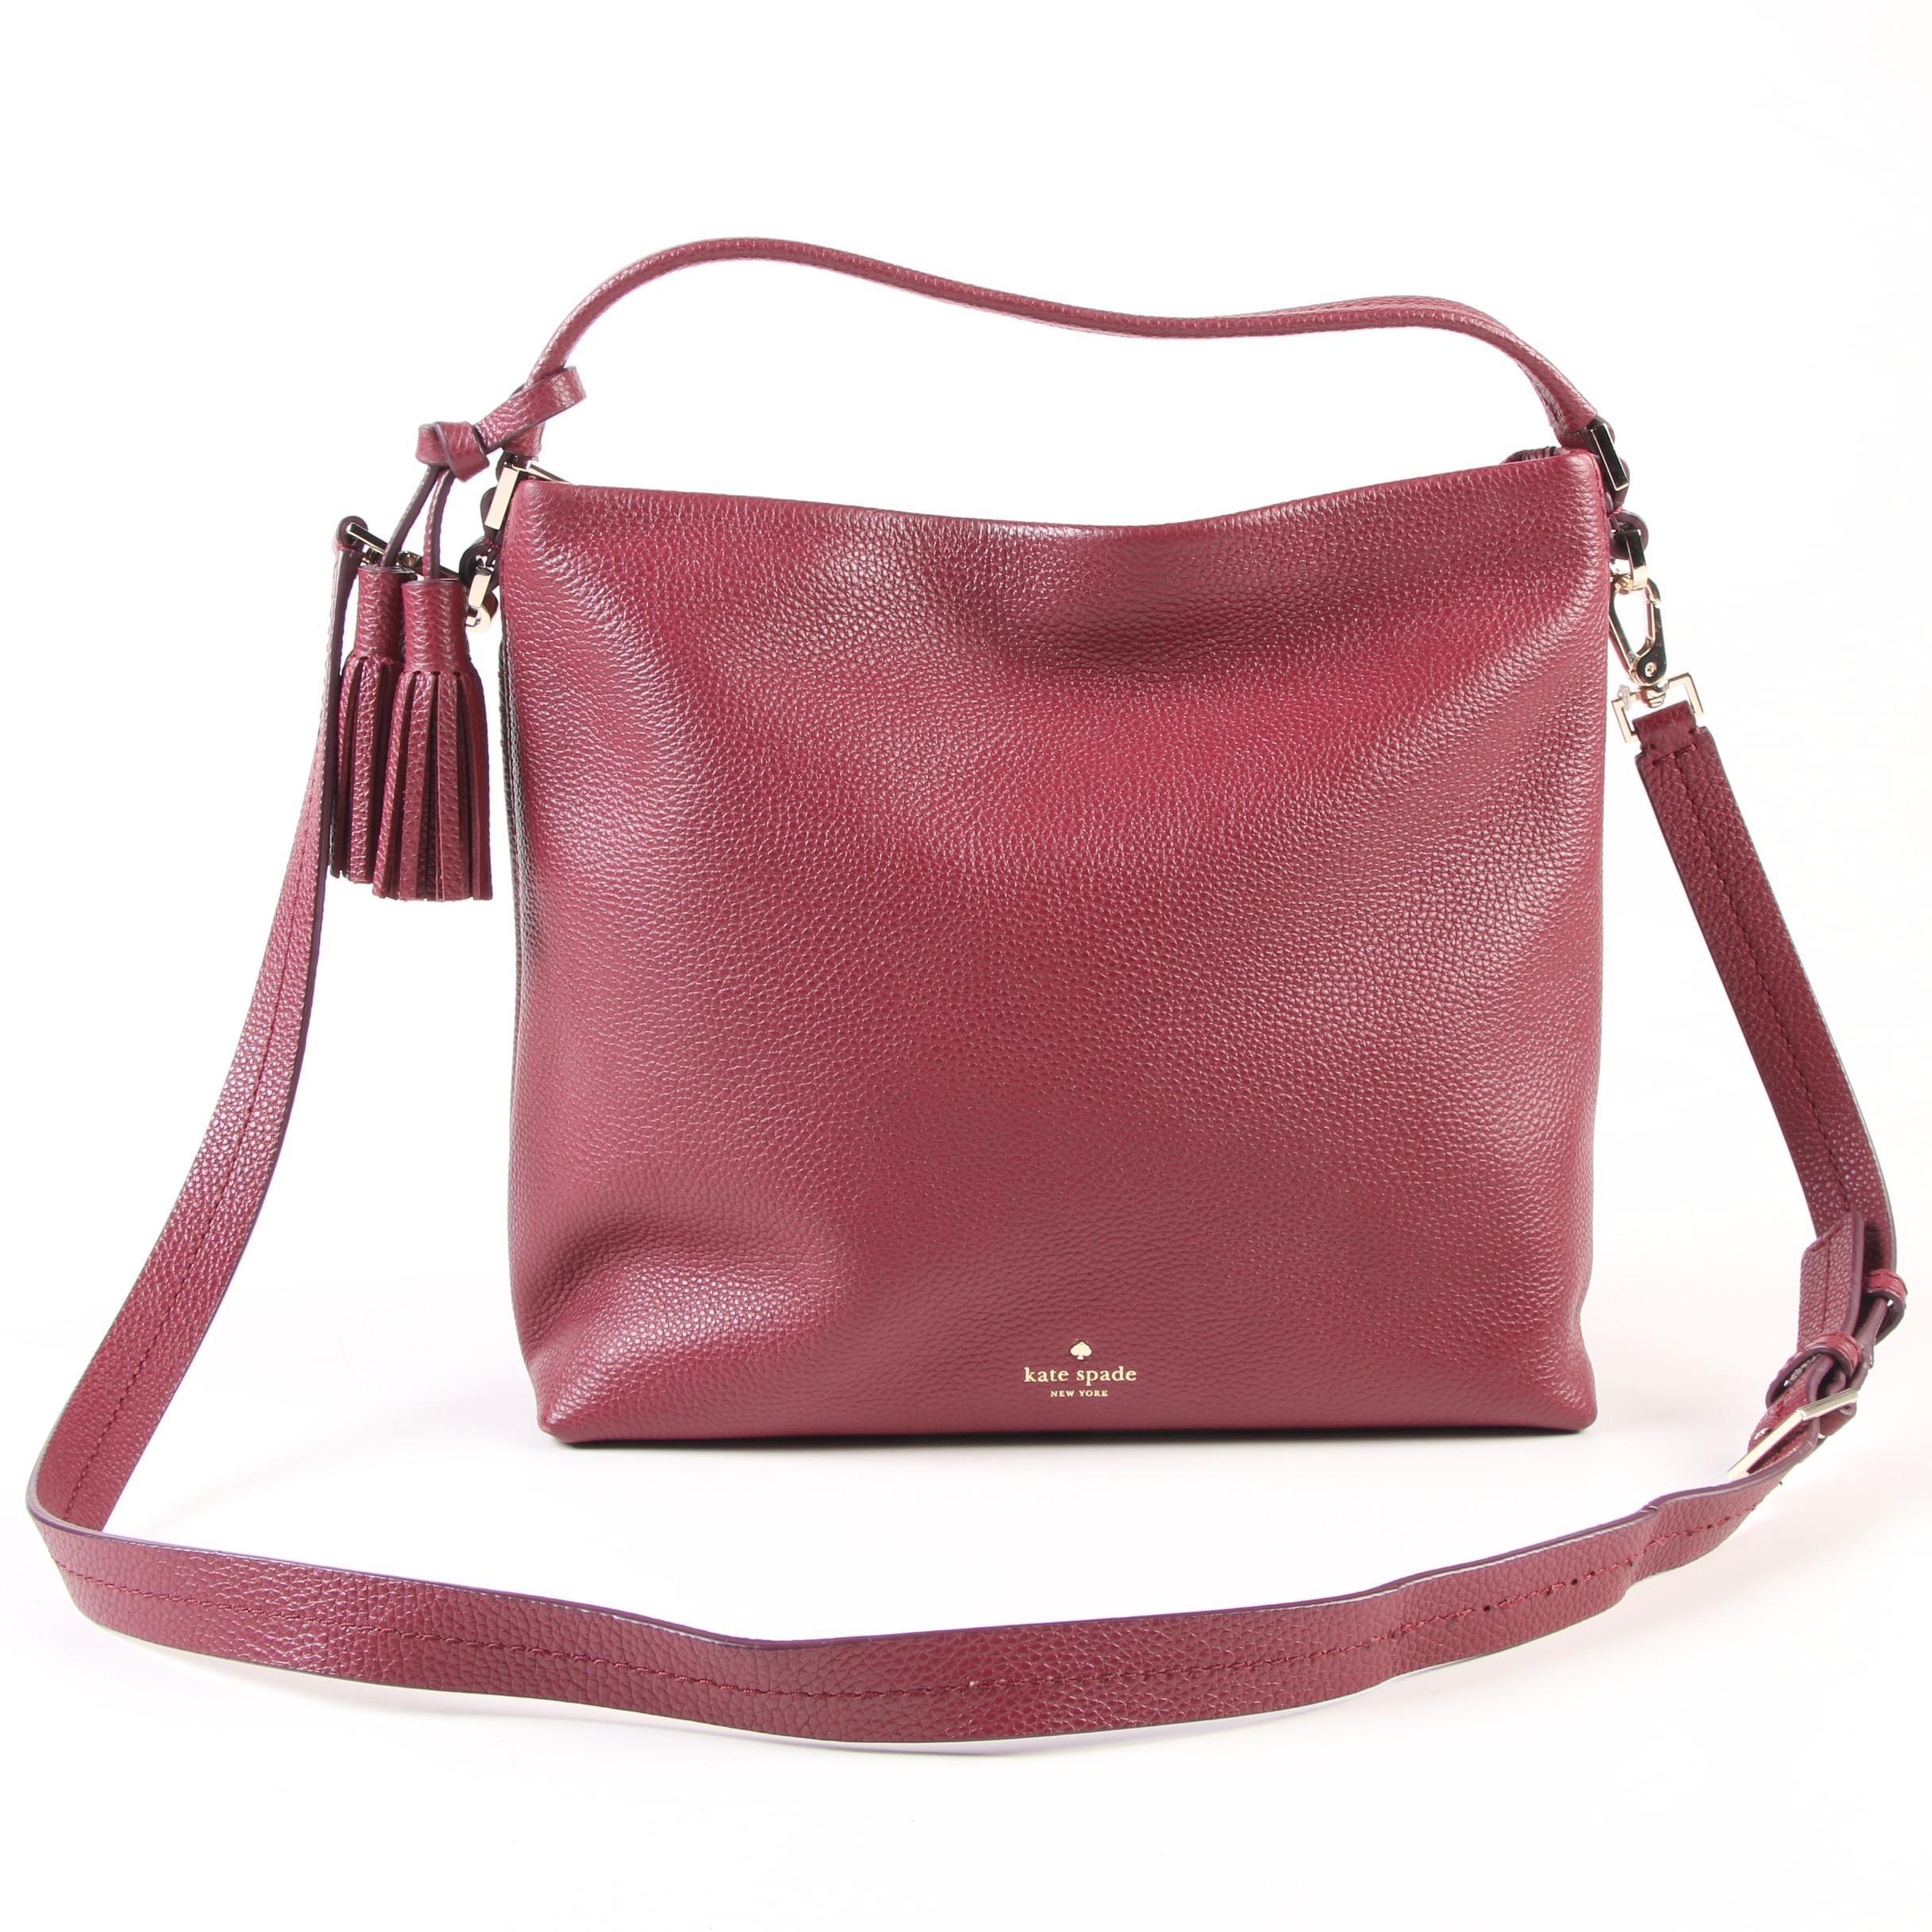 Kate Spade New York Wine Pebbled Leather Convertible Handbag with Tassels